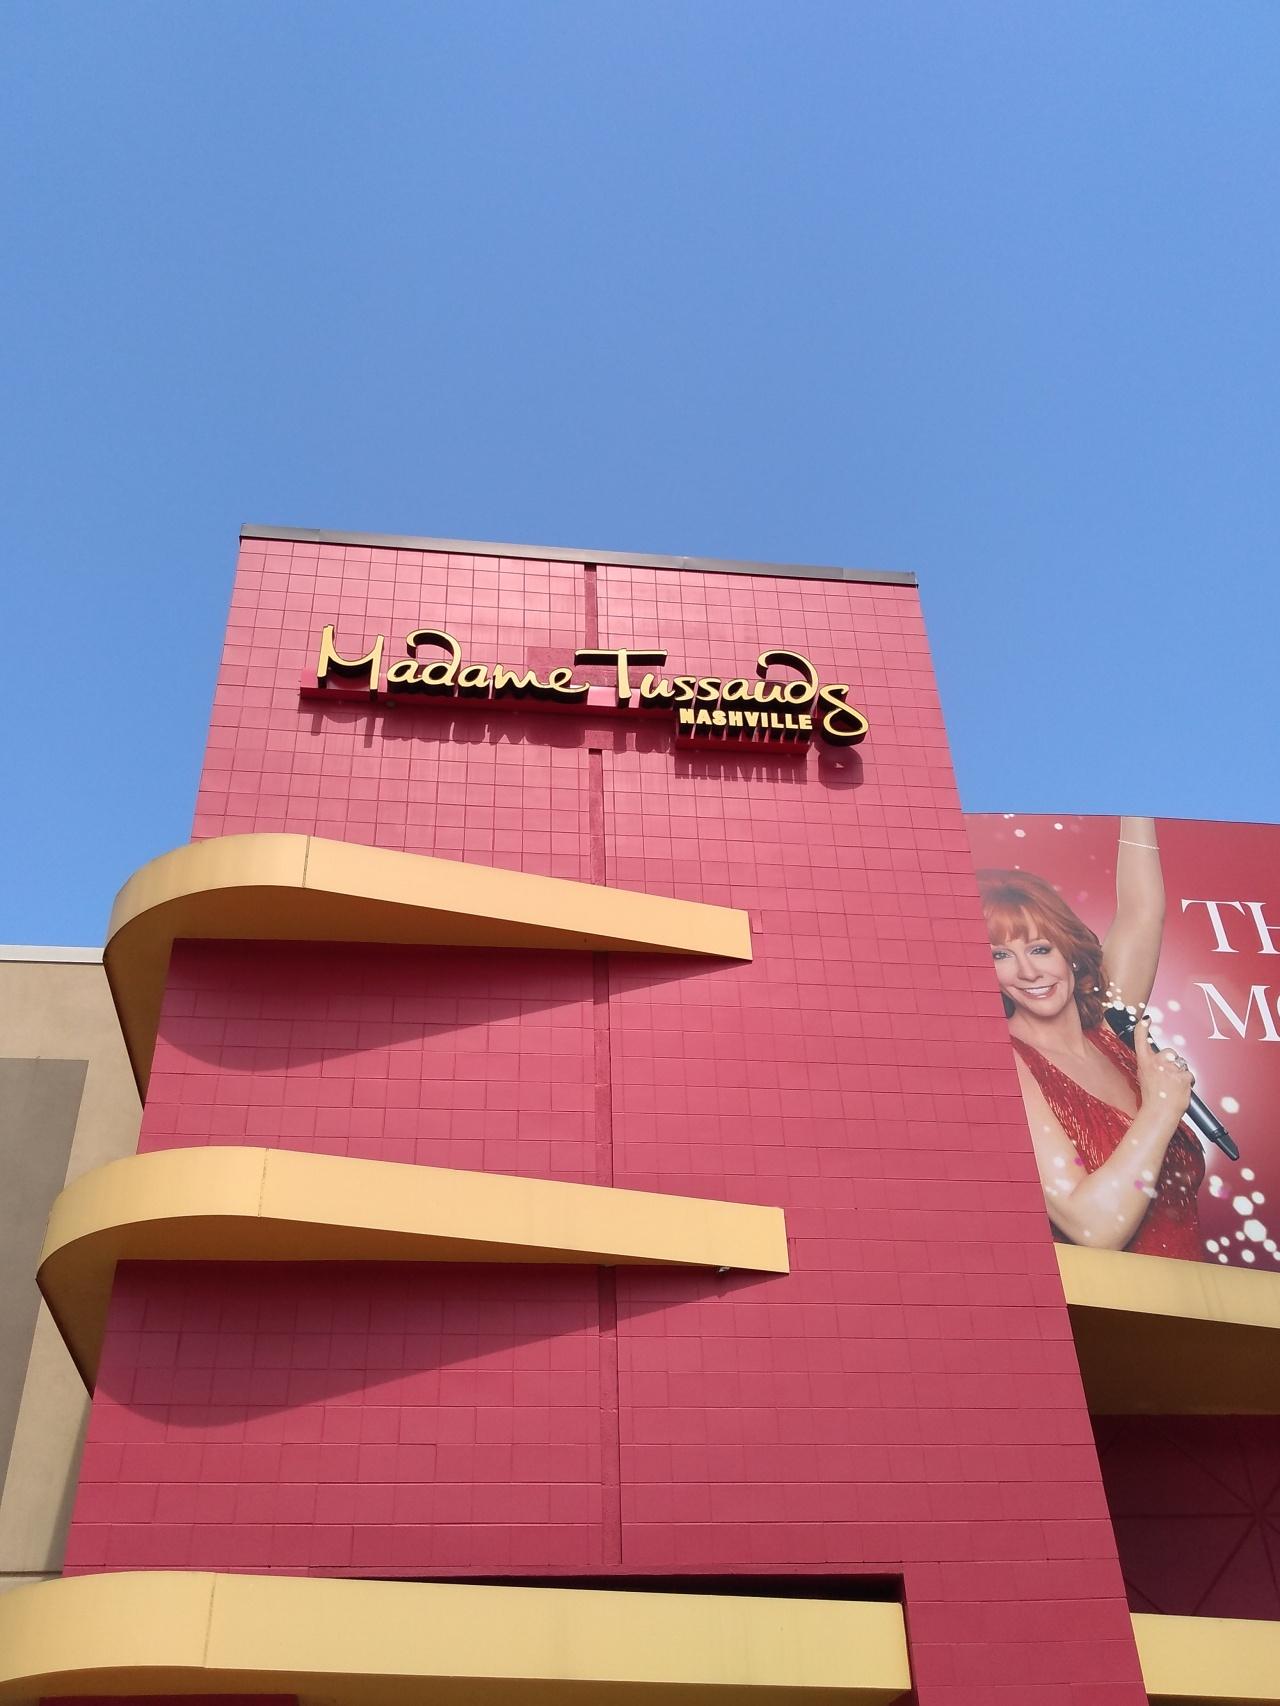 Madame Tussaud's Wax Museum Nashville,Tennessee